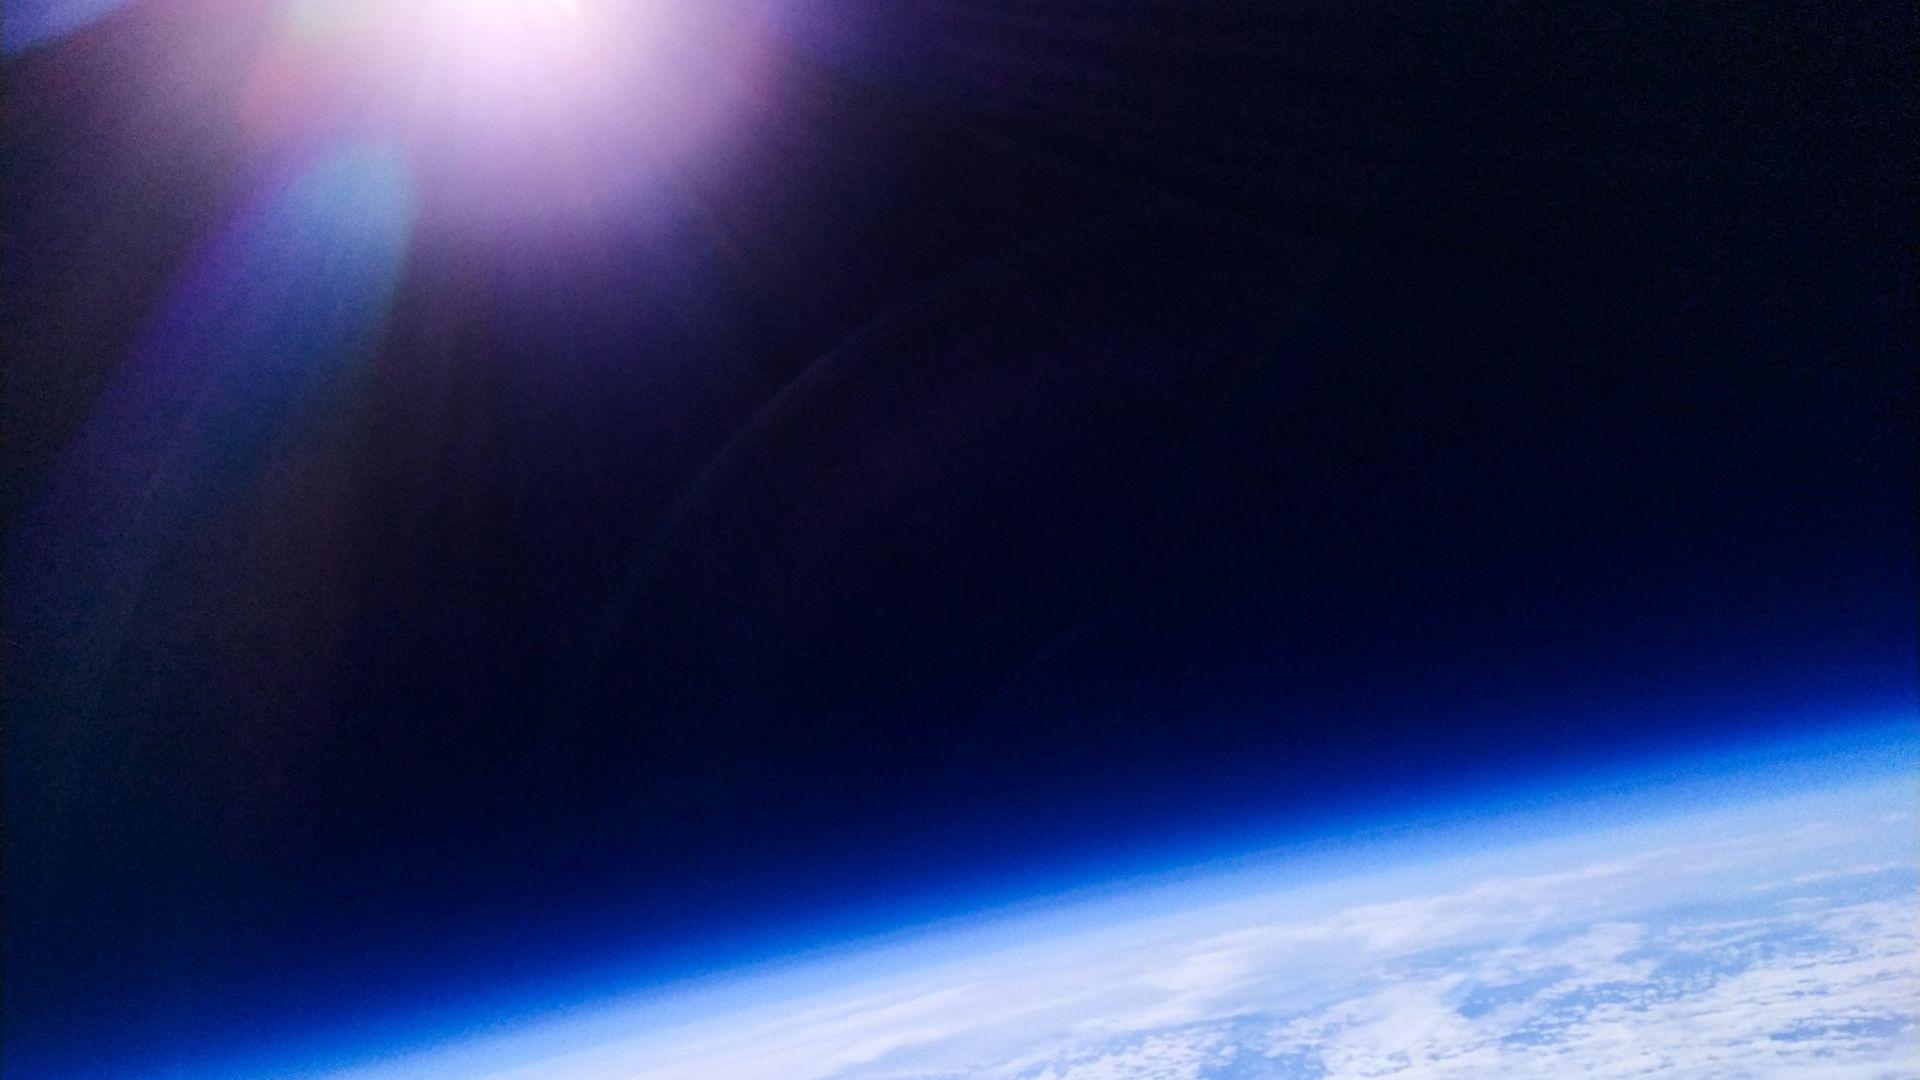 Redmi Note 7 провери дали Земята е плоска